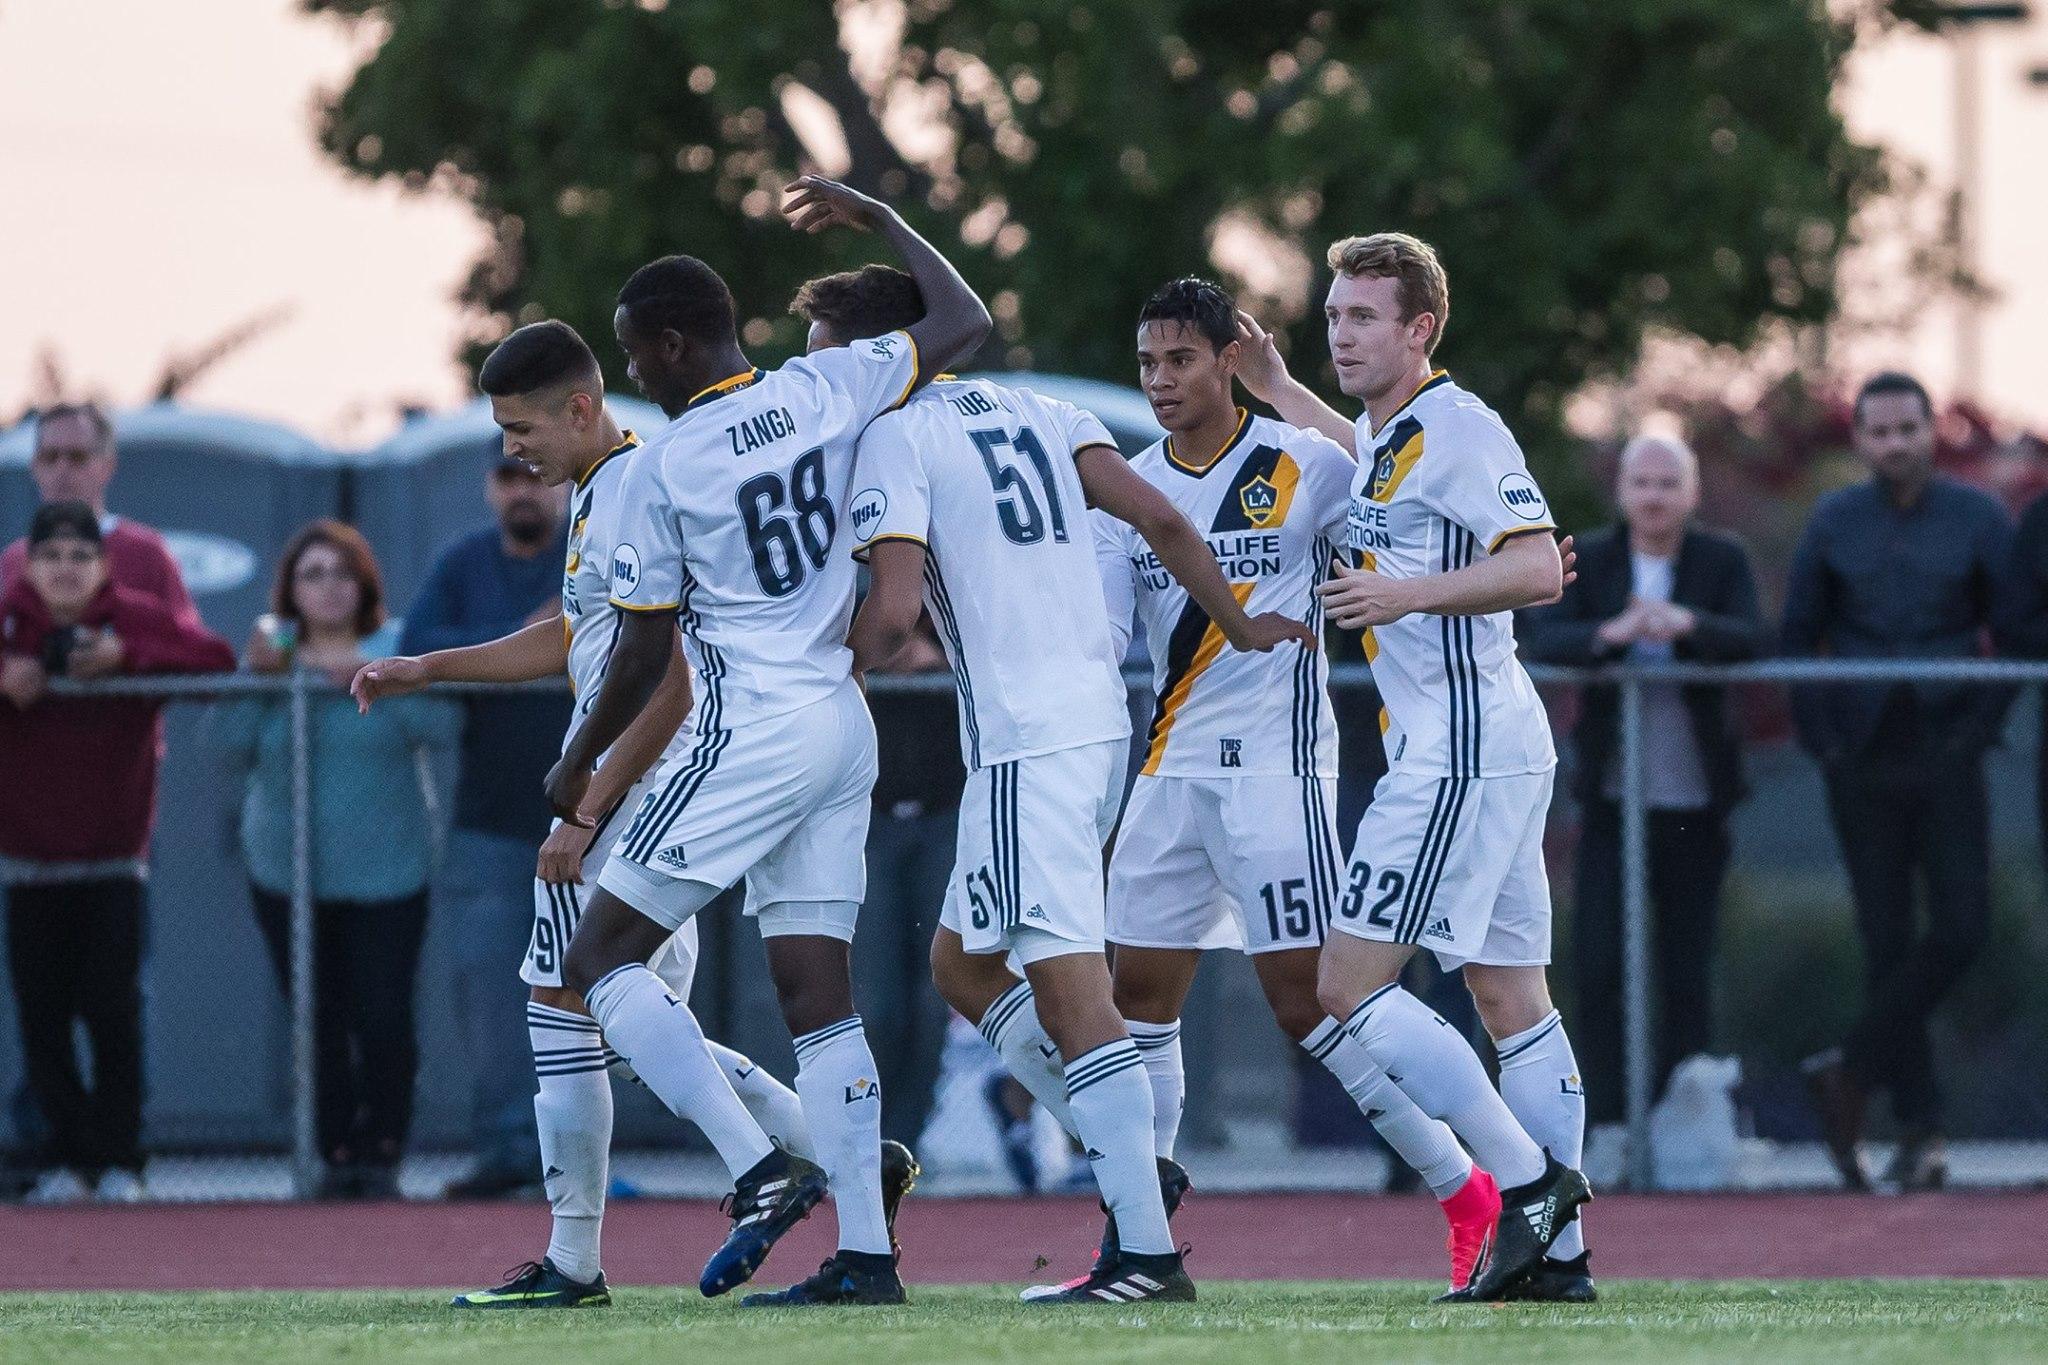 LA Galaxy II host Colorado Springs Switchbacks in league play